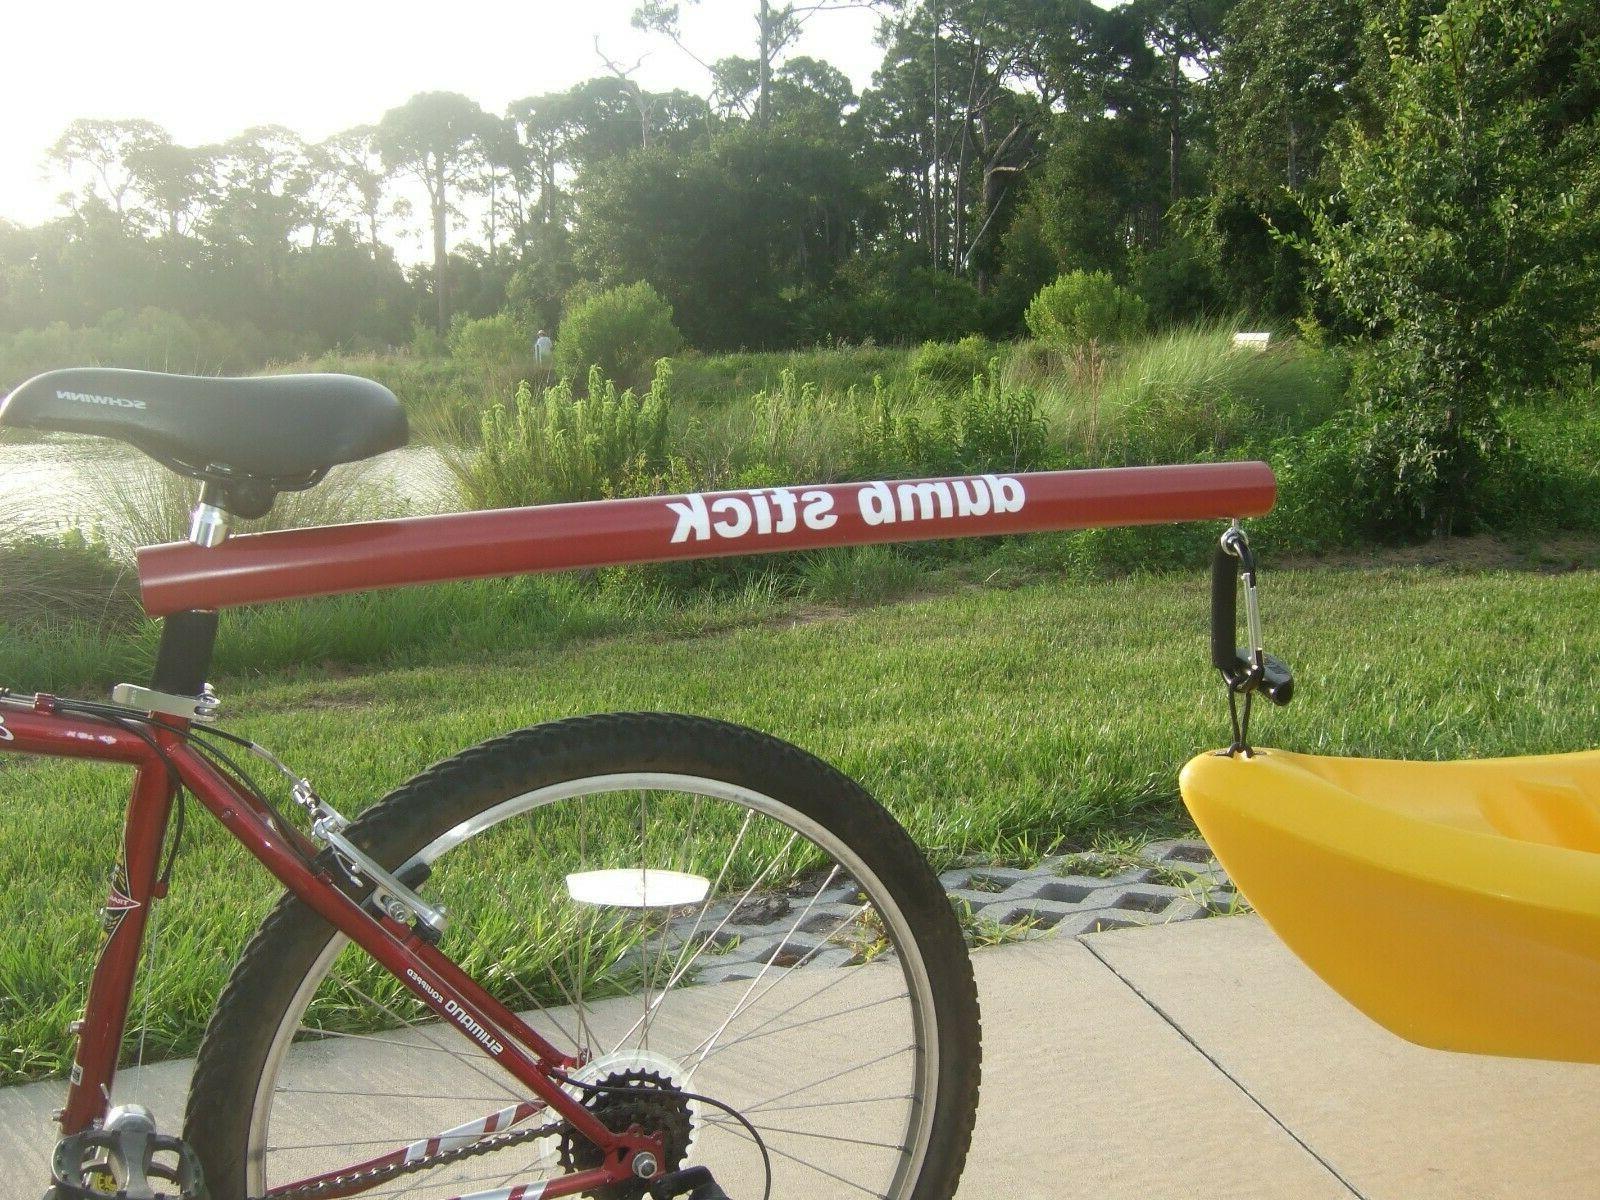 Kayak Tow Trailer, Stick, Bicycle Trailer